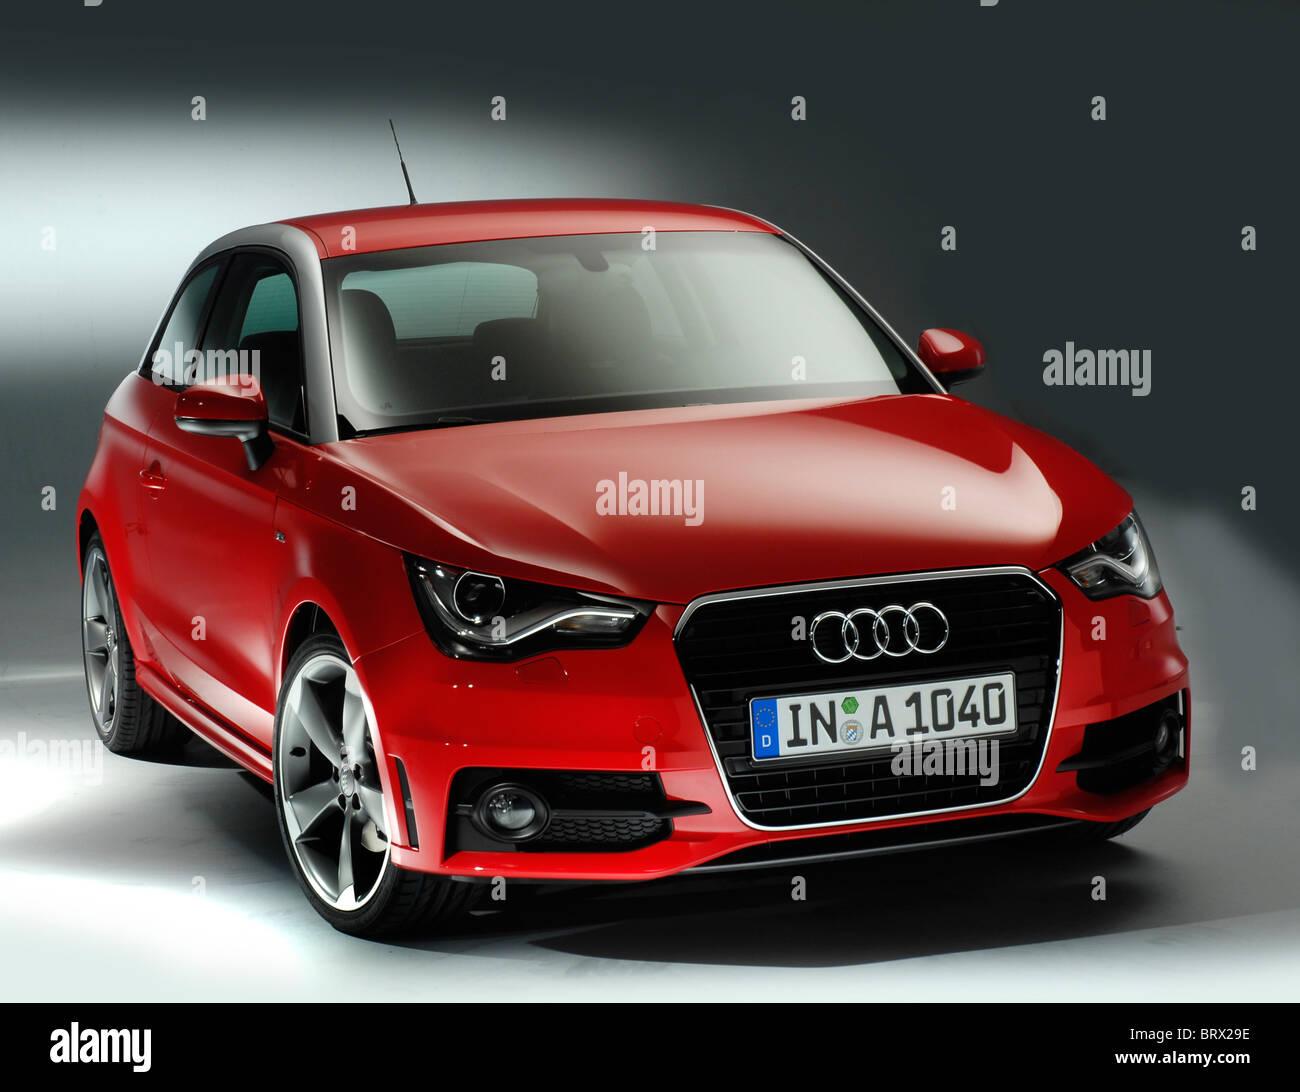 Audi A1 2010 - Stock Image